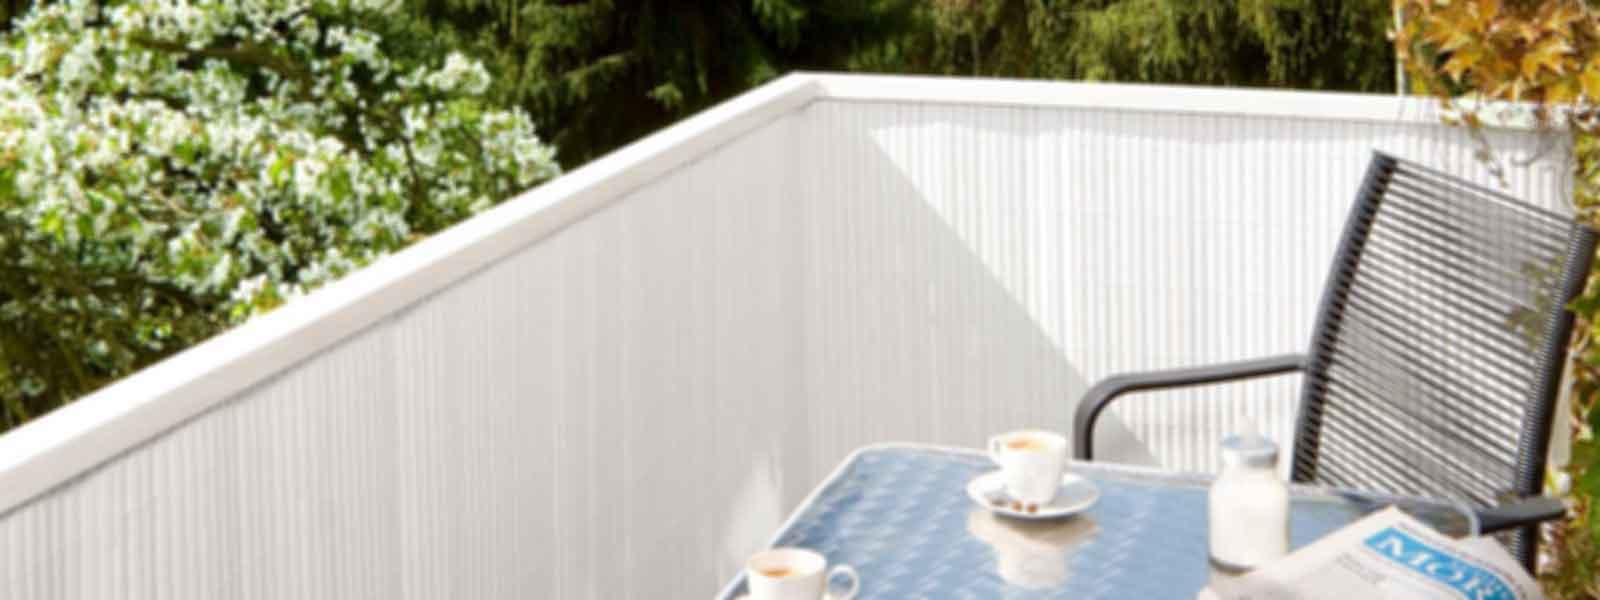 Pvc Balkon Sichtschutz Befestigen CARPROLA for